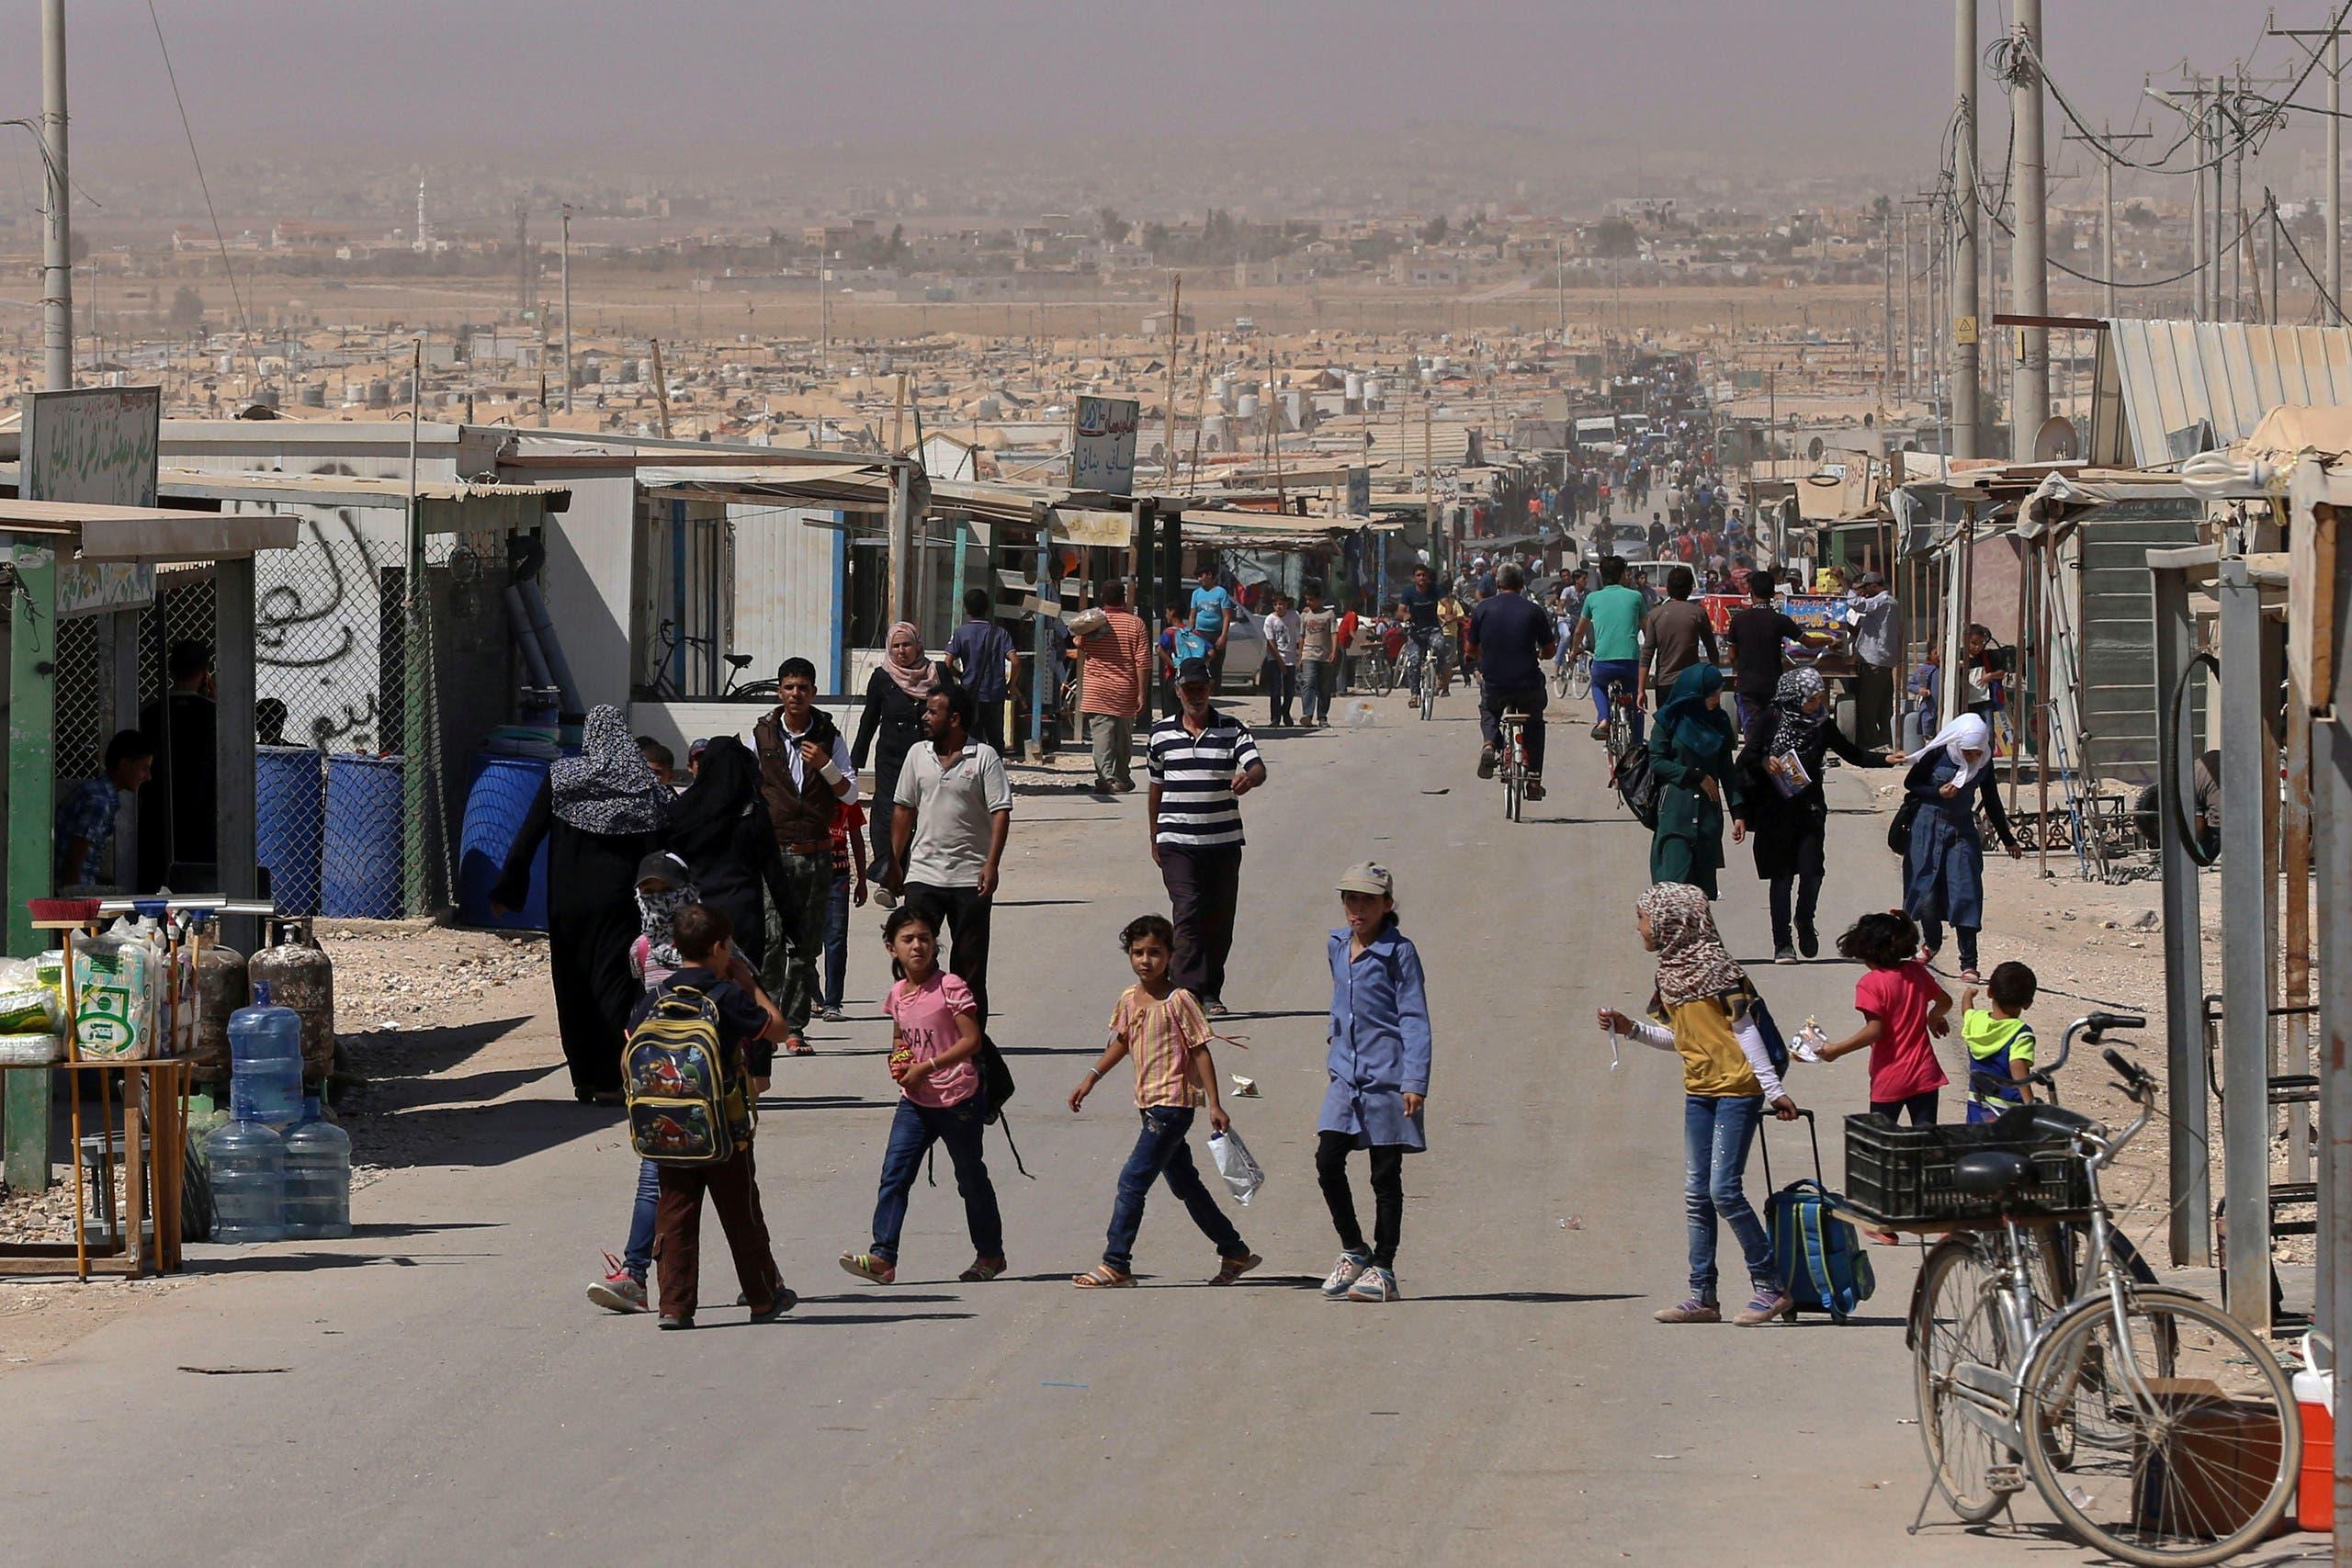 In this Thursday, Oct. 1, 2015 photo, Syrian refugees stroll on the main street of the U.N.-run Zaatari refugee camp near Mafraq, northern Jordan. AP